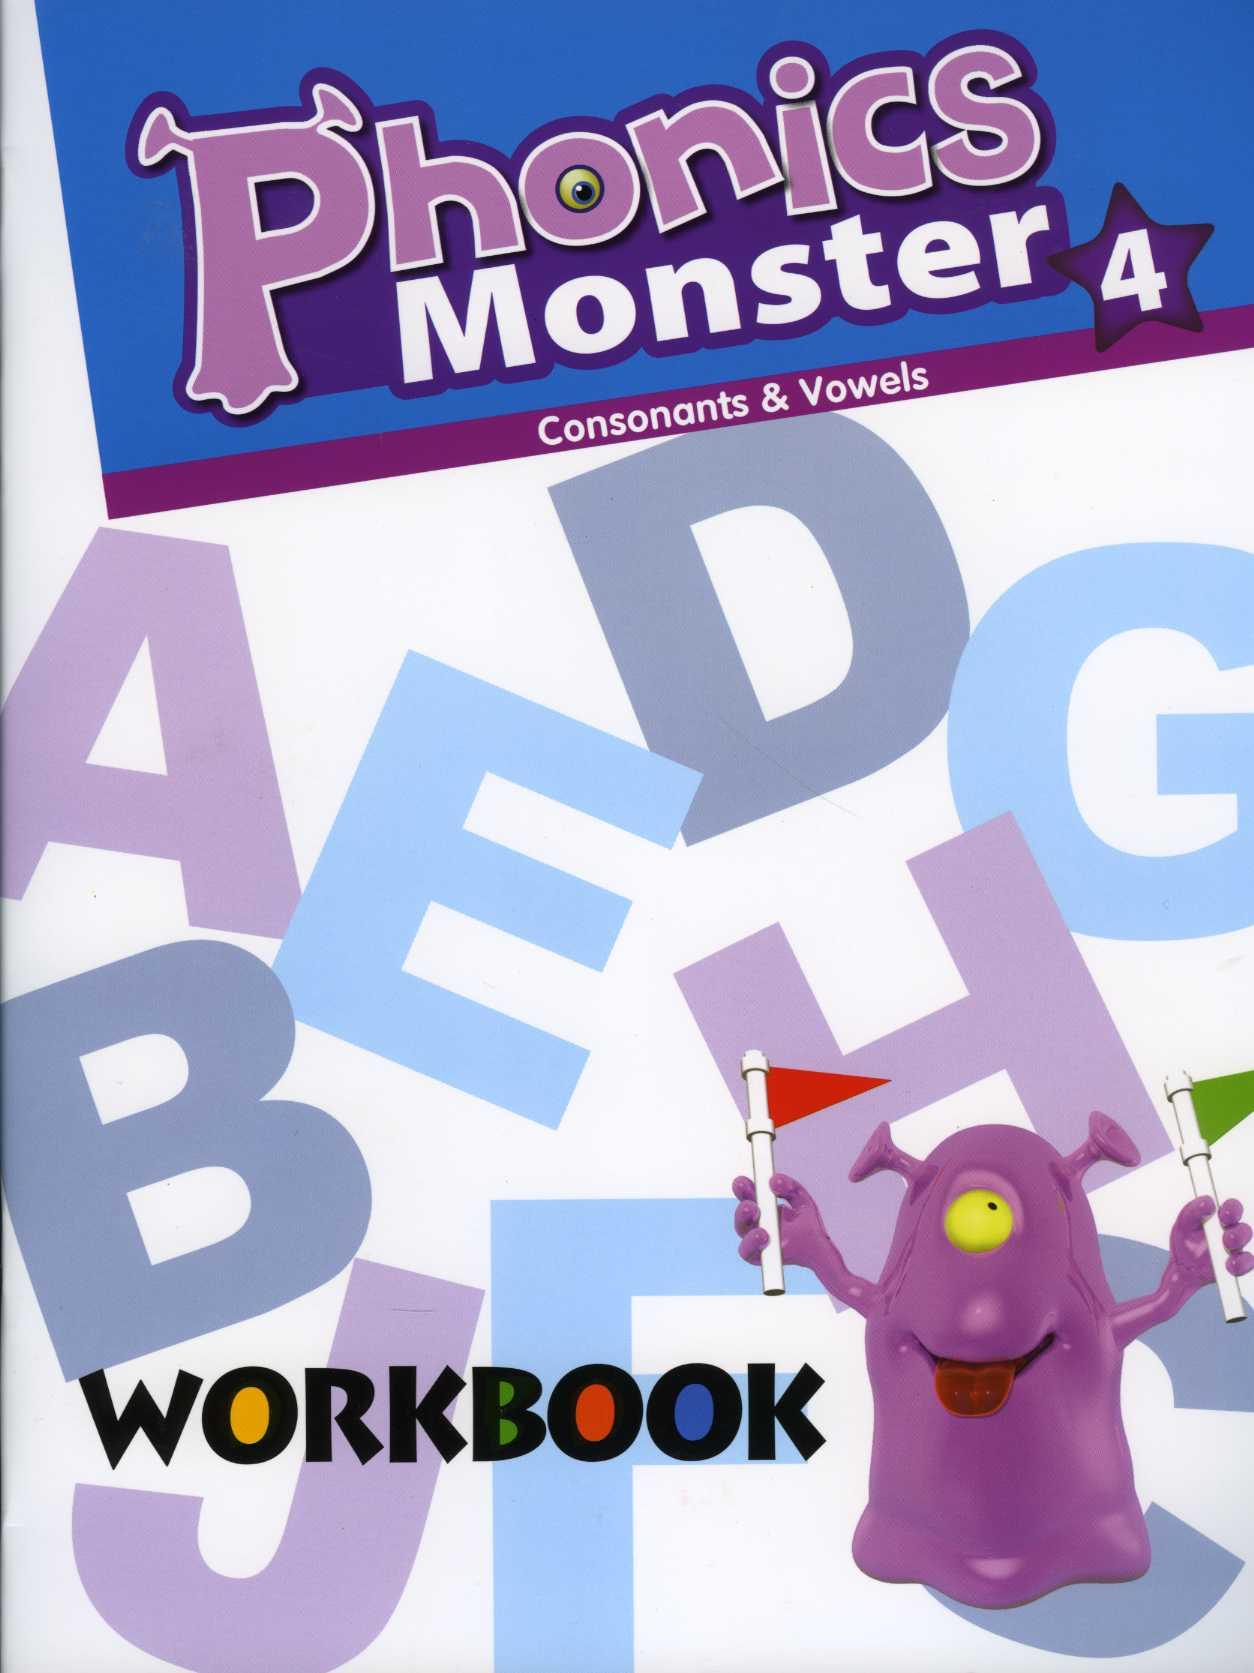 Phonics Monster 4 Workbook